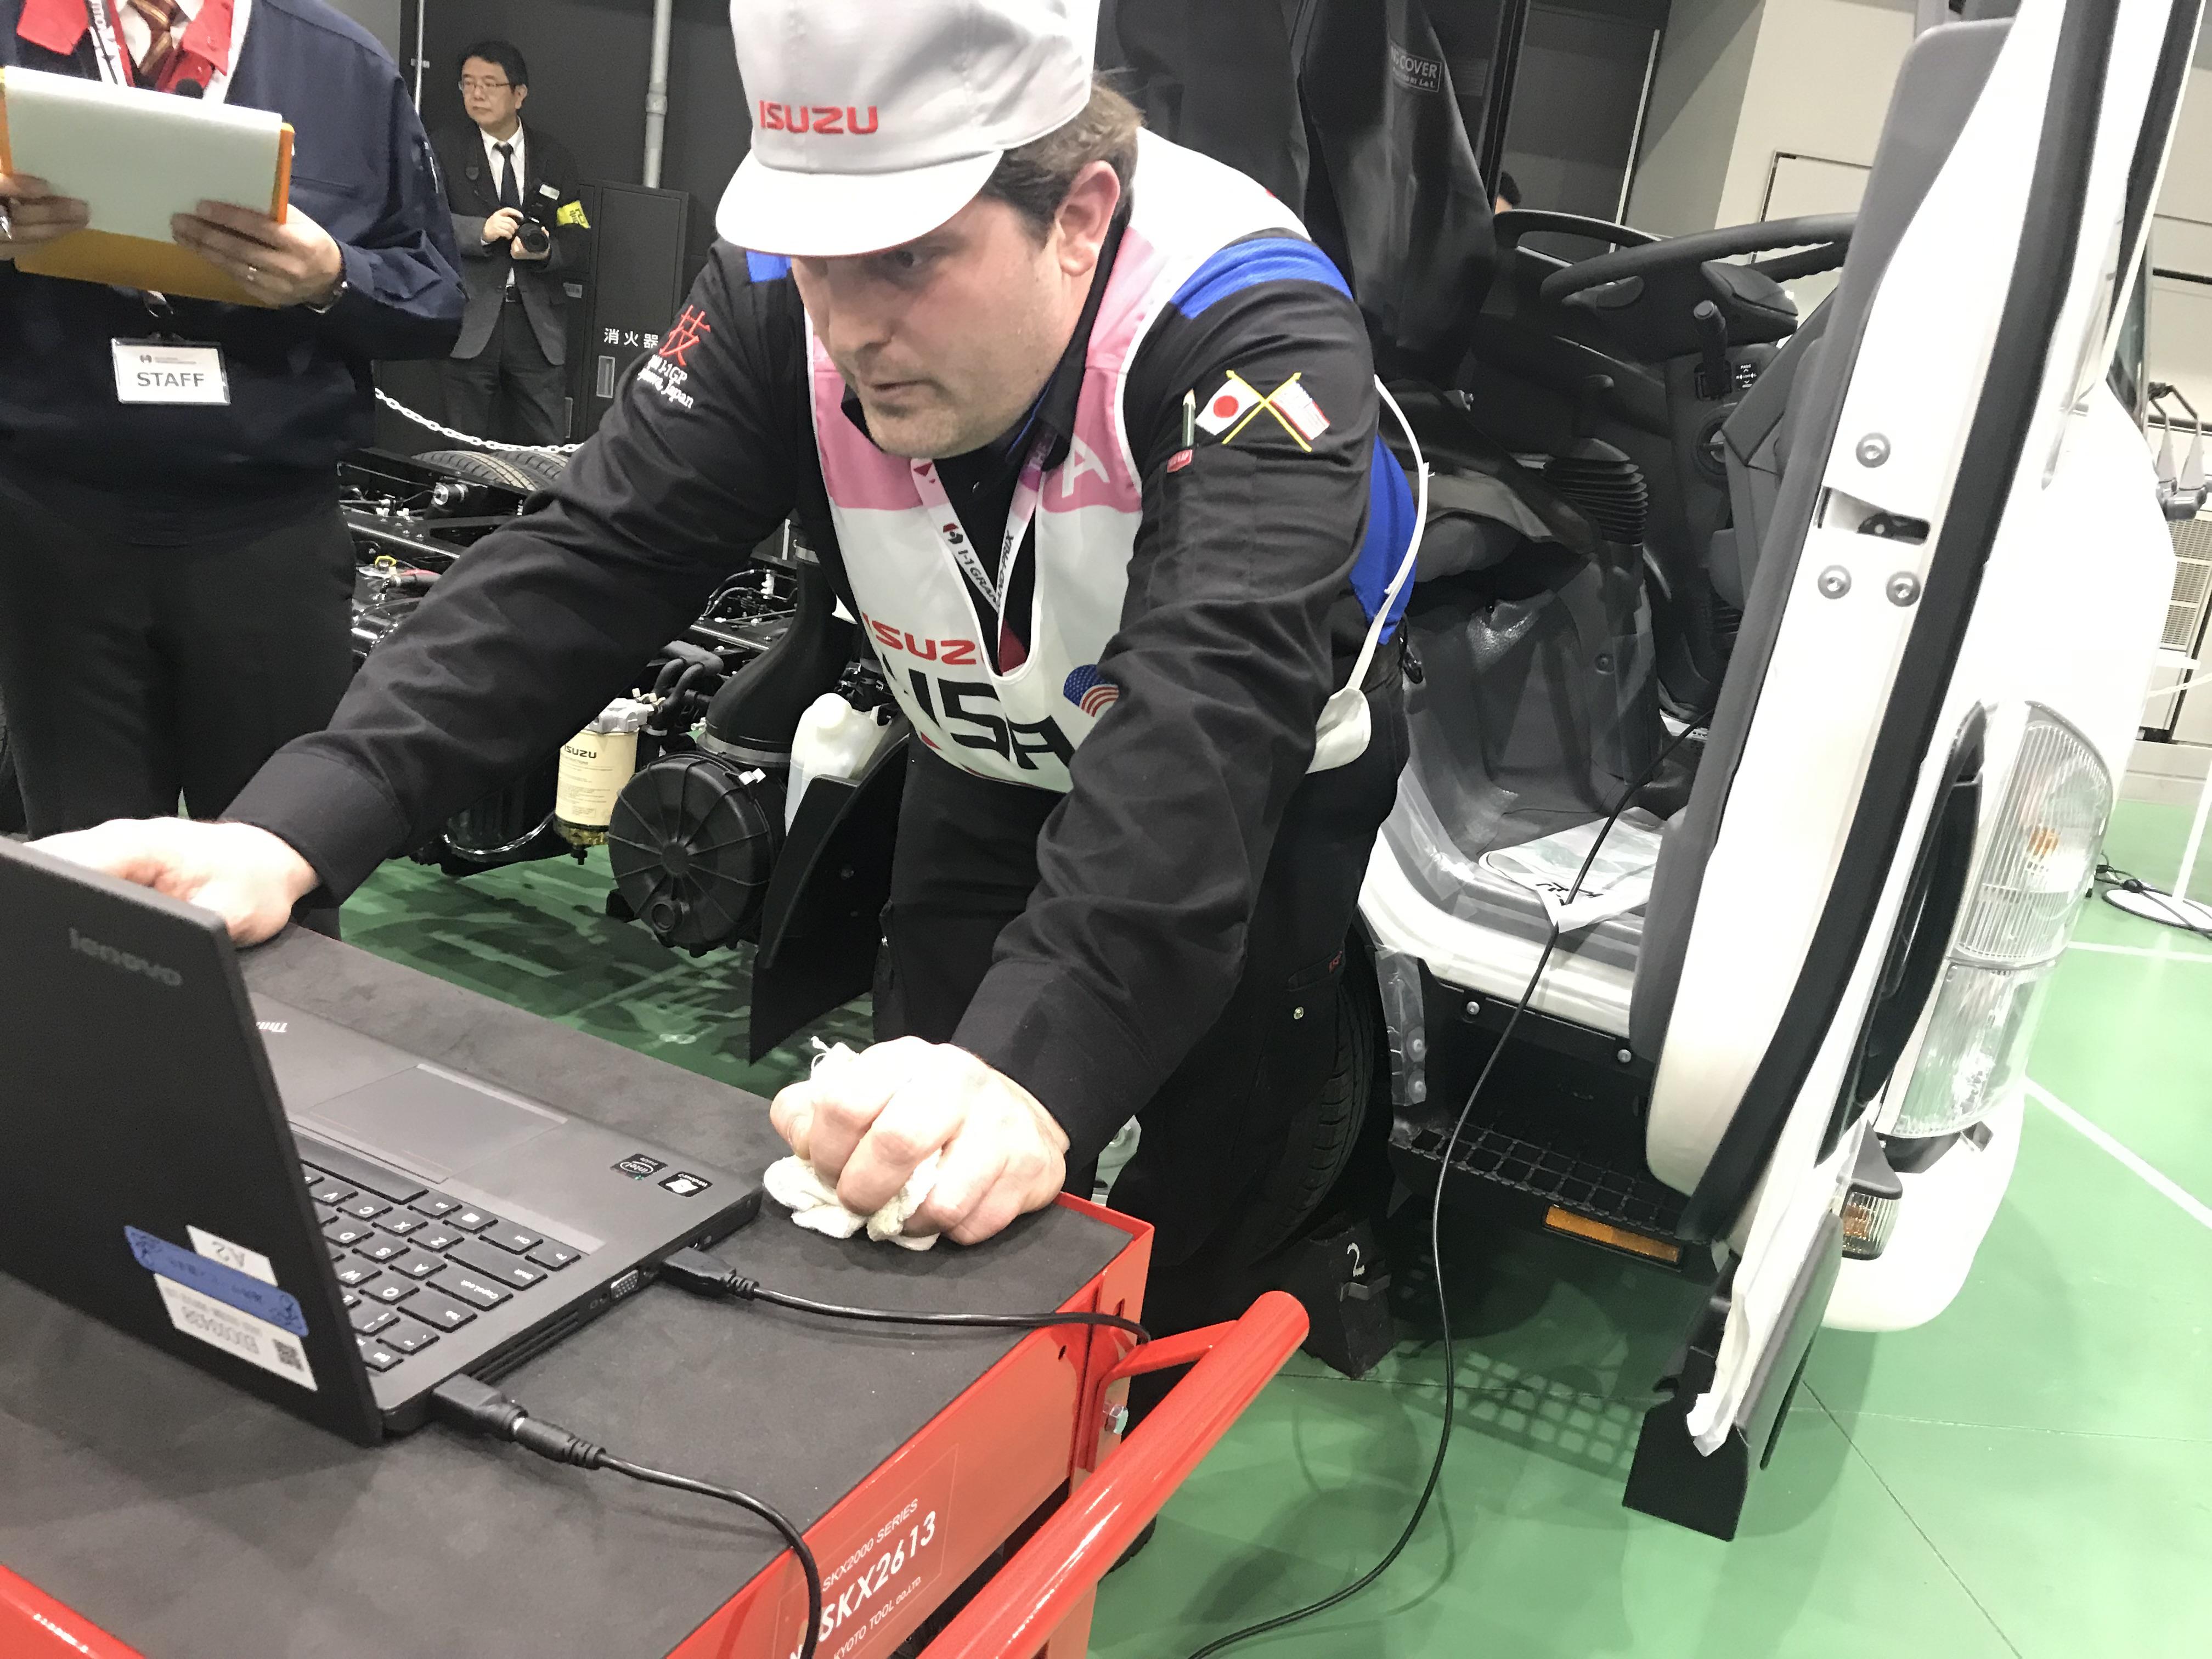 Team USA takes 2nd place in Isuzu technician challenge